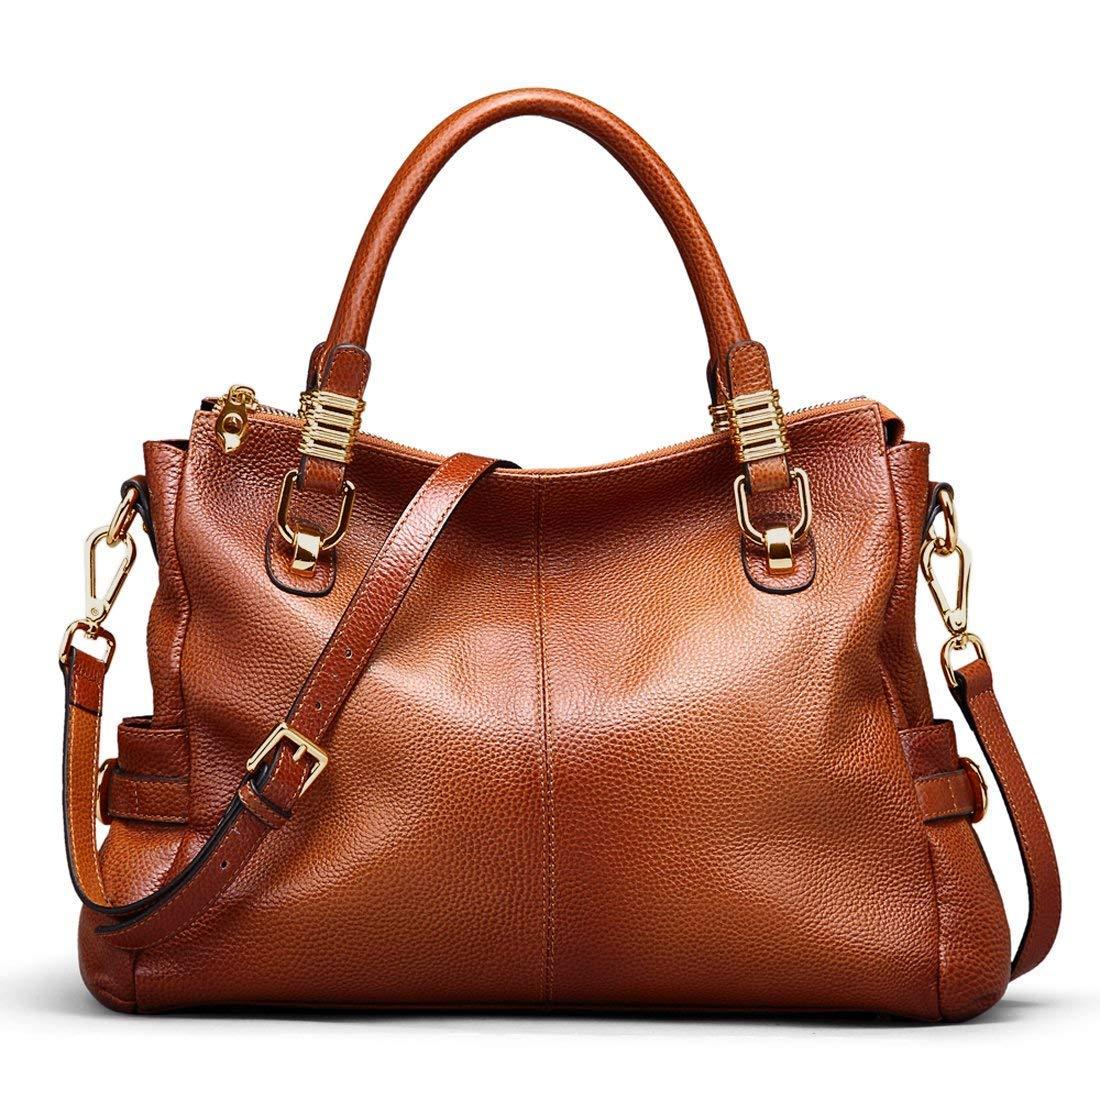 BIG SALE-AINIMOER Womens Soft Vintage Genuine Leather Tote Shoulder Bag Top-handle Crossbody Handbags Ladies' Messenger Purse(Black)